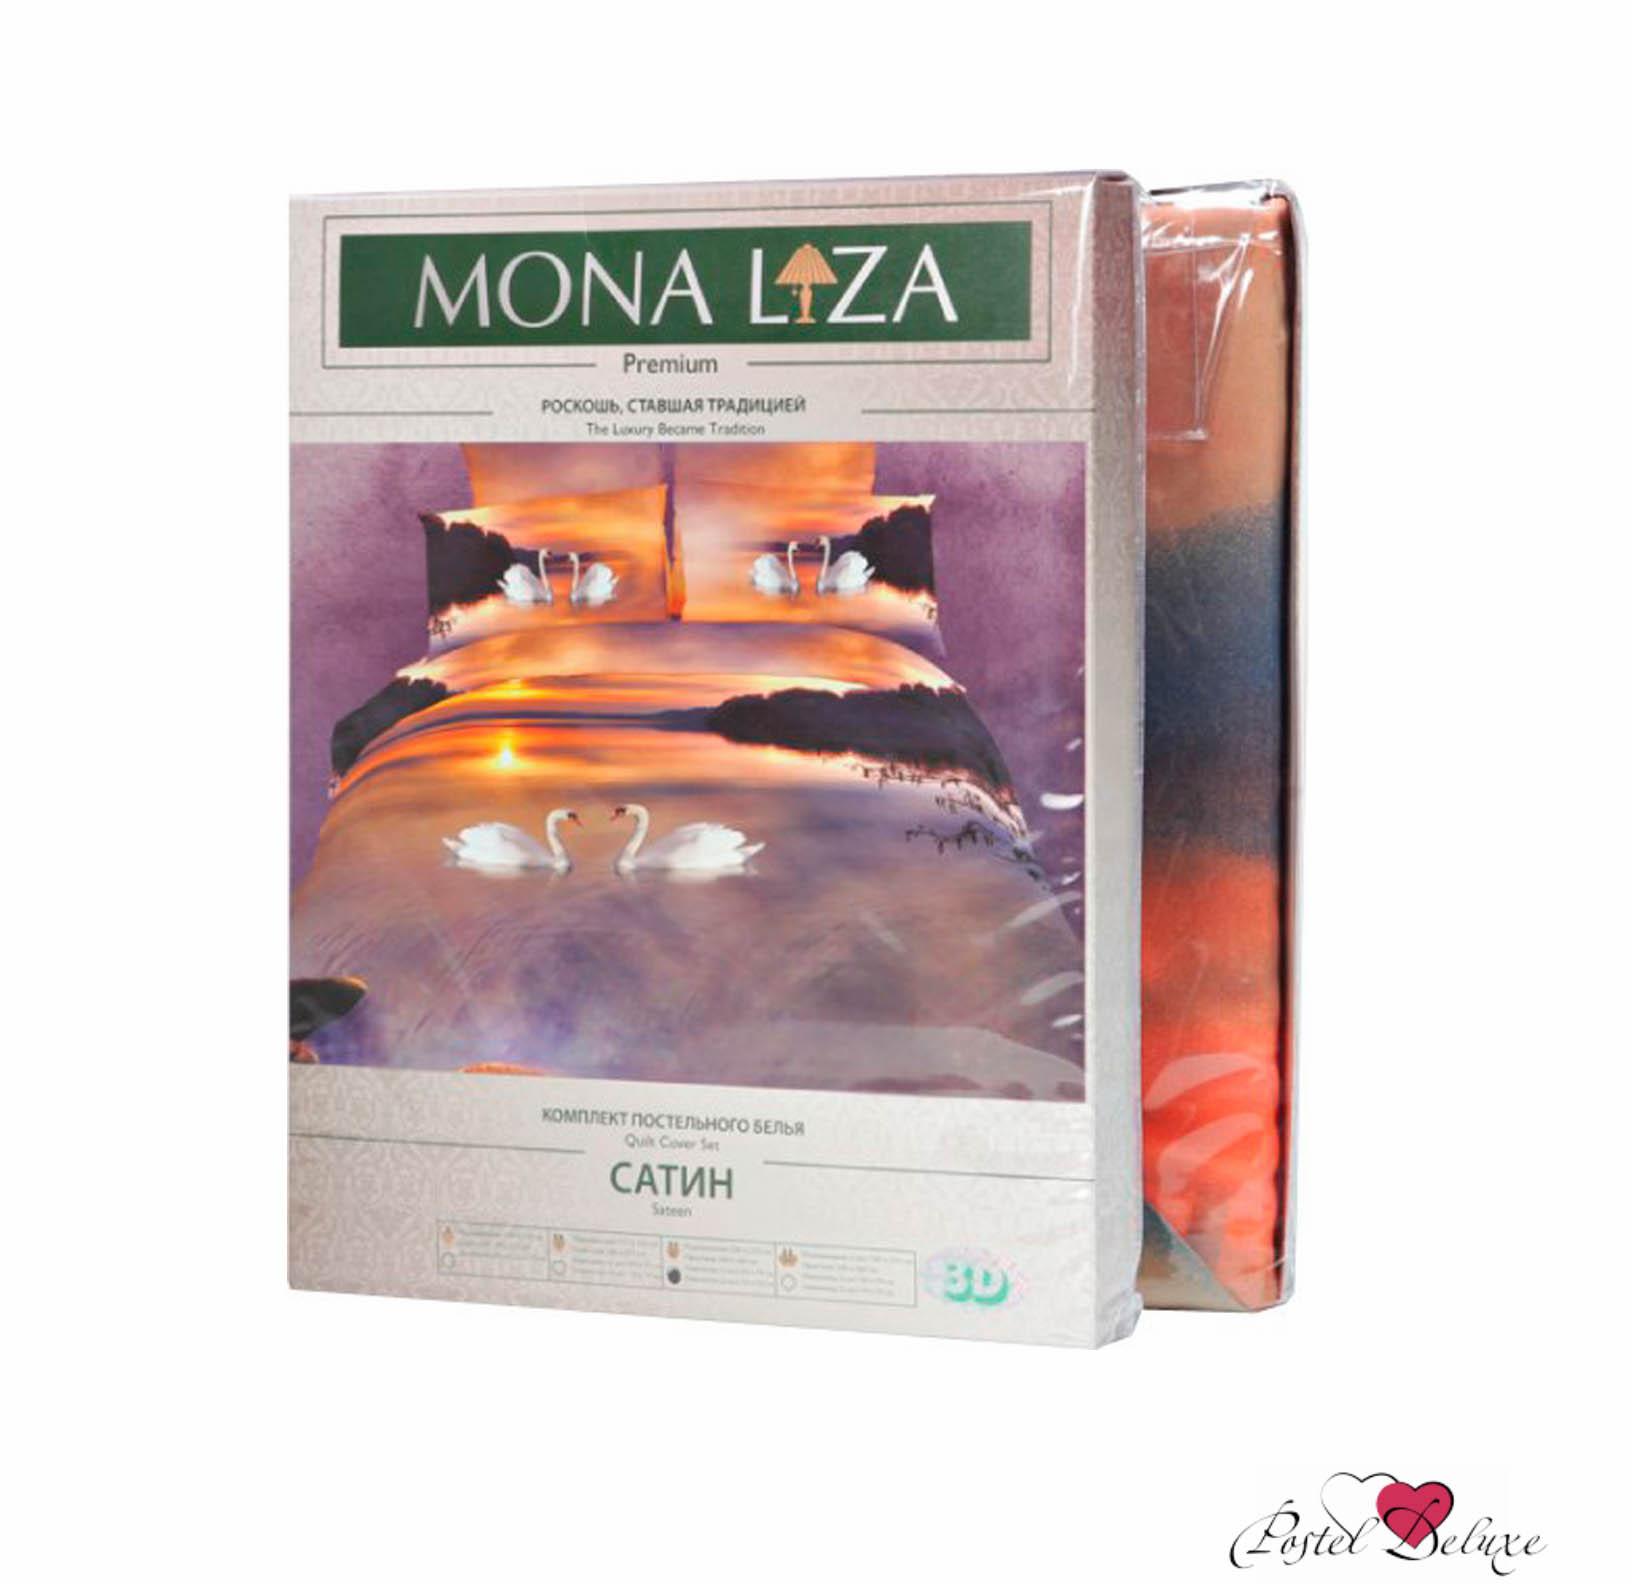 Постельное белье Mona Liza Постельное белье Two (2 сп. евро) комплект пб 2 сп mona liza сатин жаккард royal 4 нав 2шт 70х70 и 2 шт